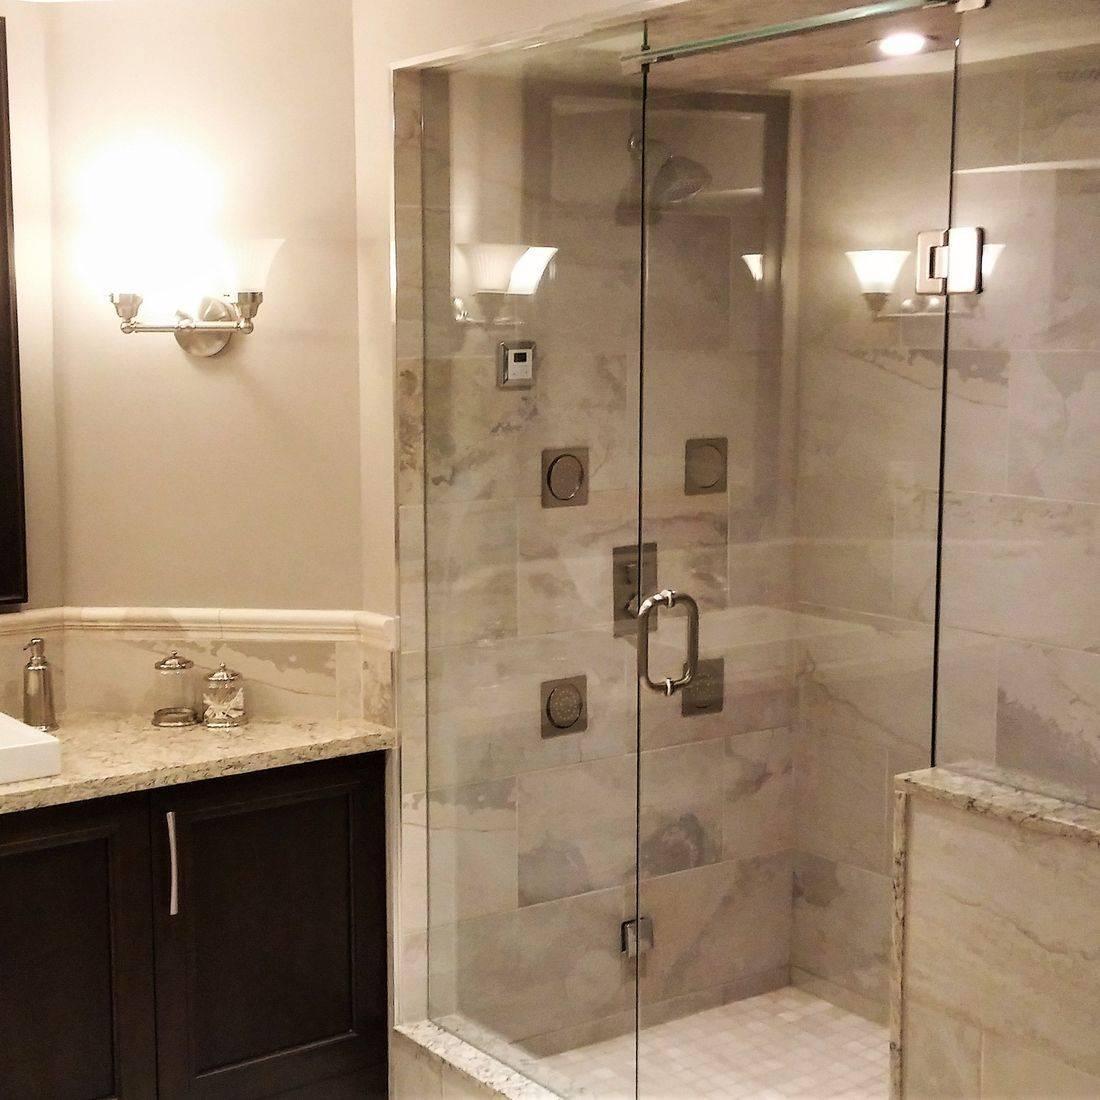 Sibra Kitchens Markham Toronto cabinets bathroom glass shower